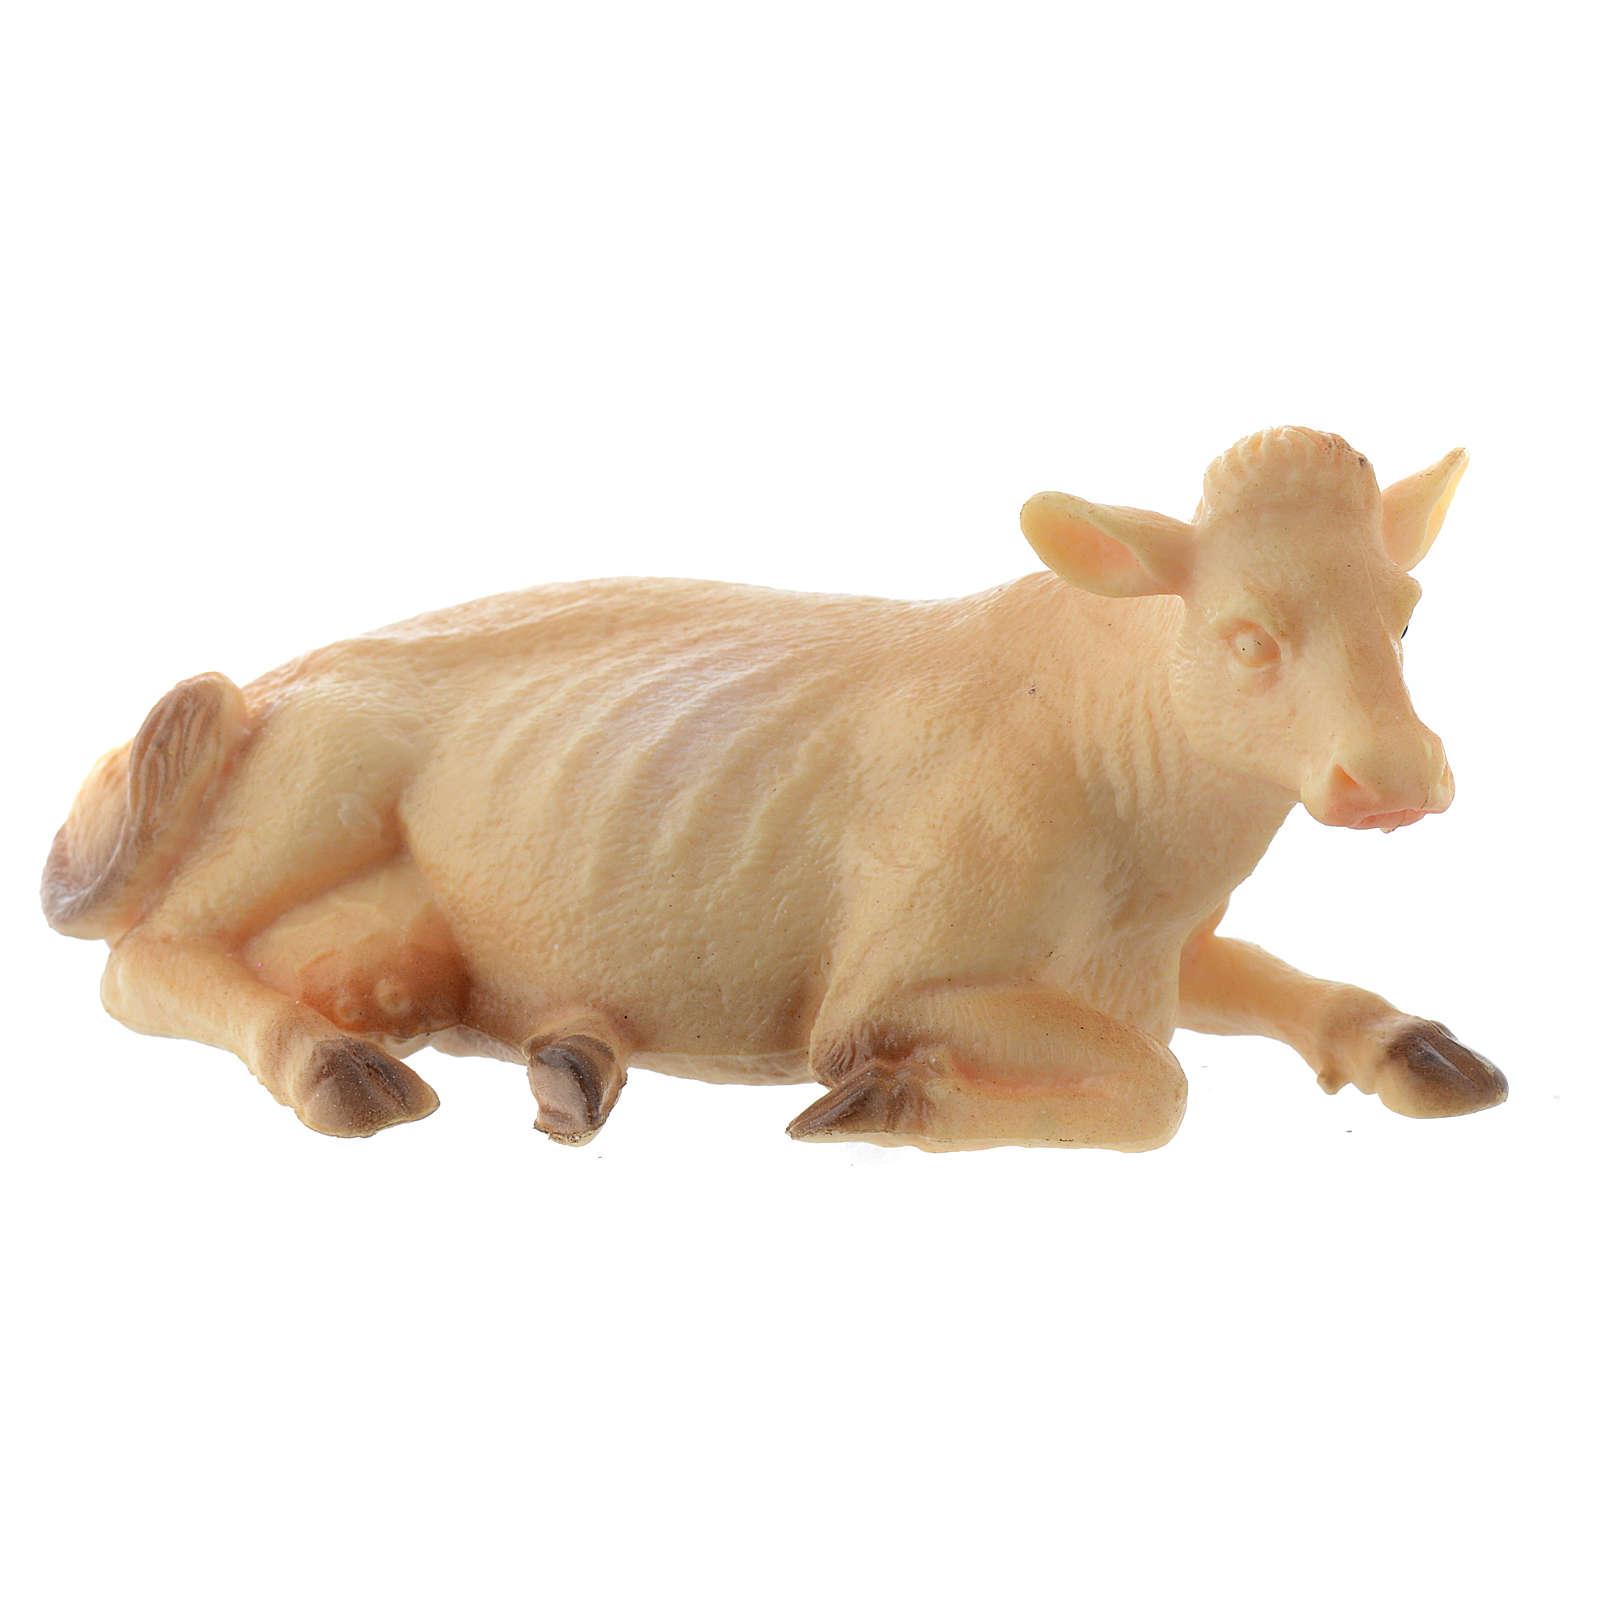 Cow in resin 10cm 3